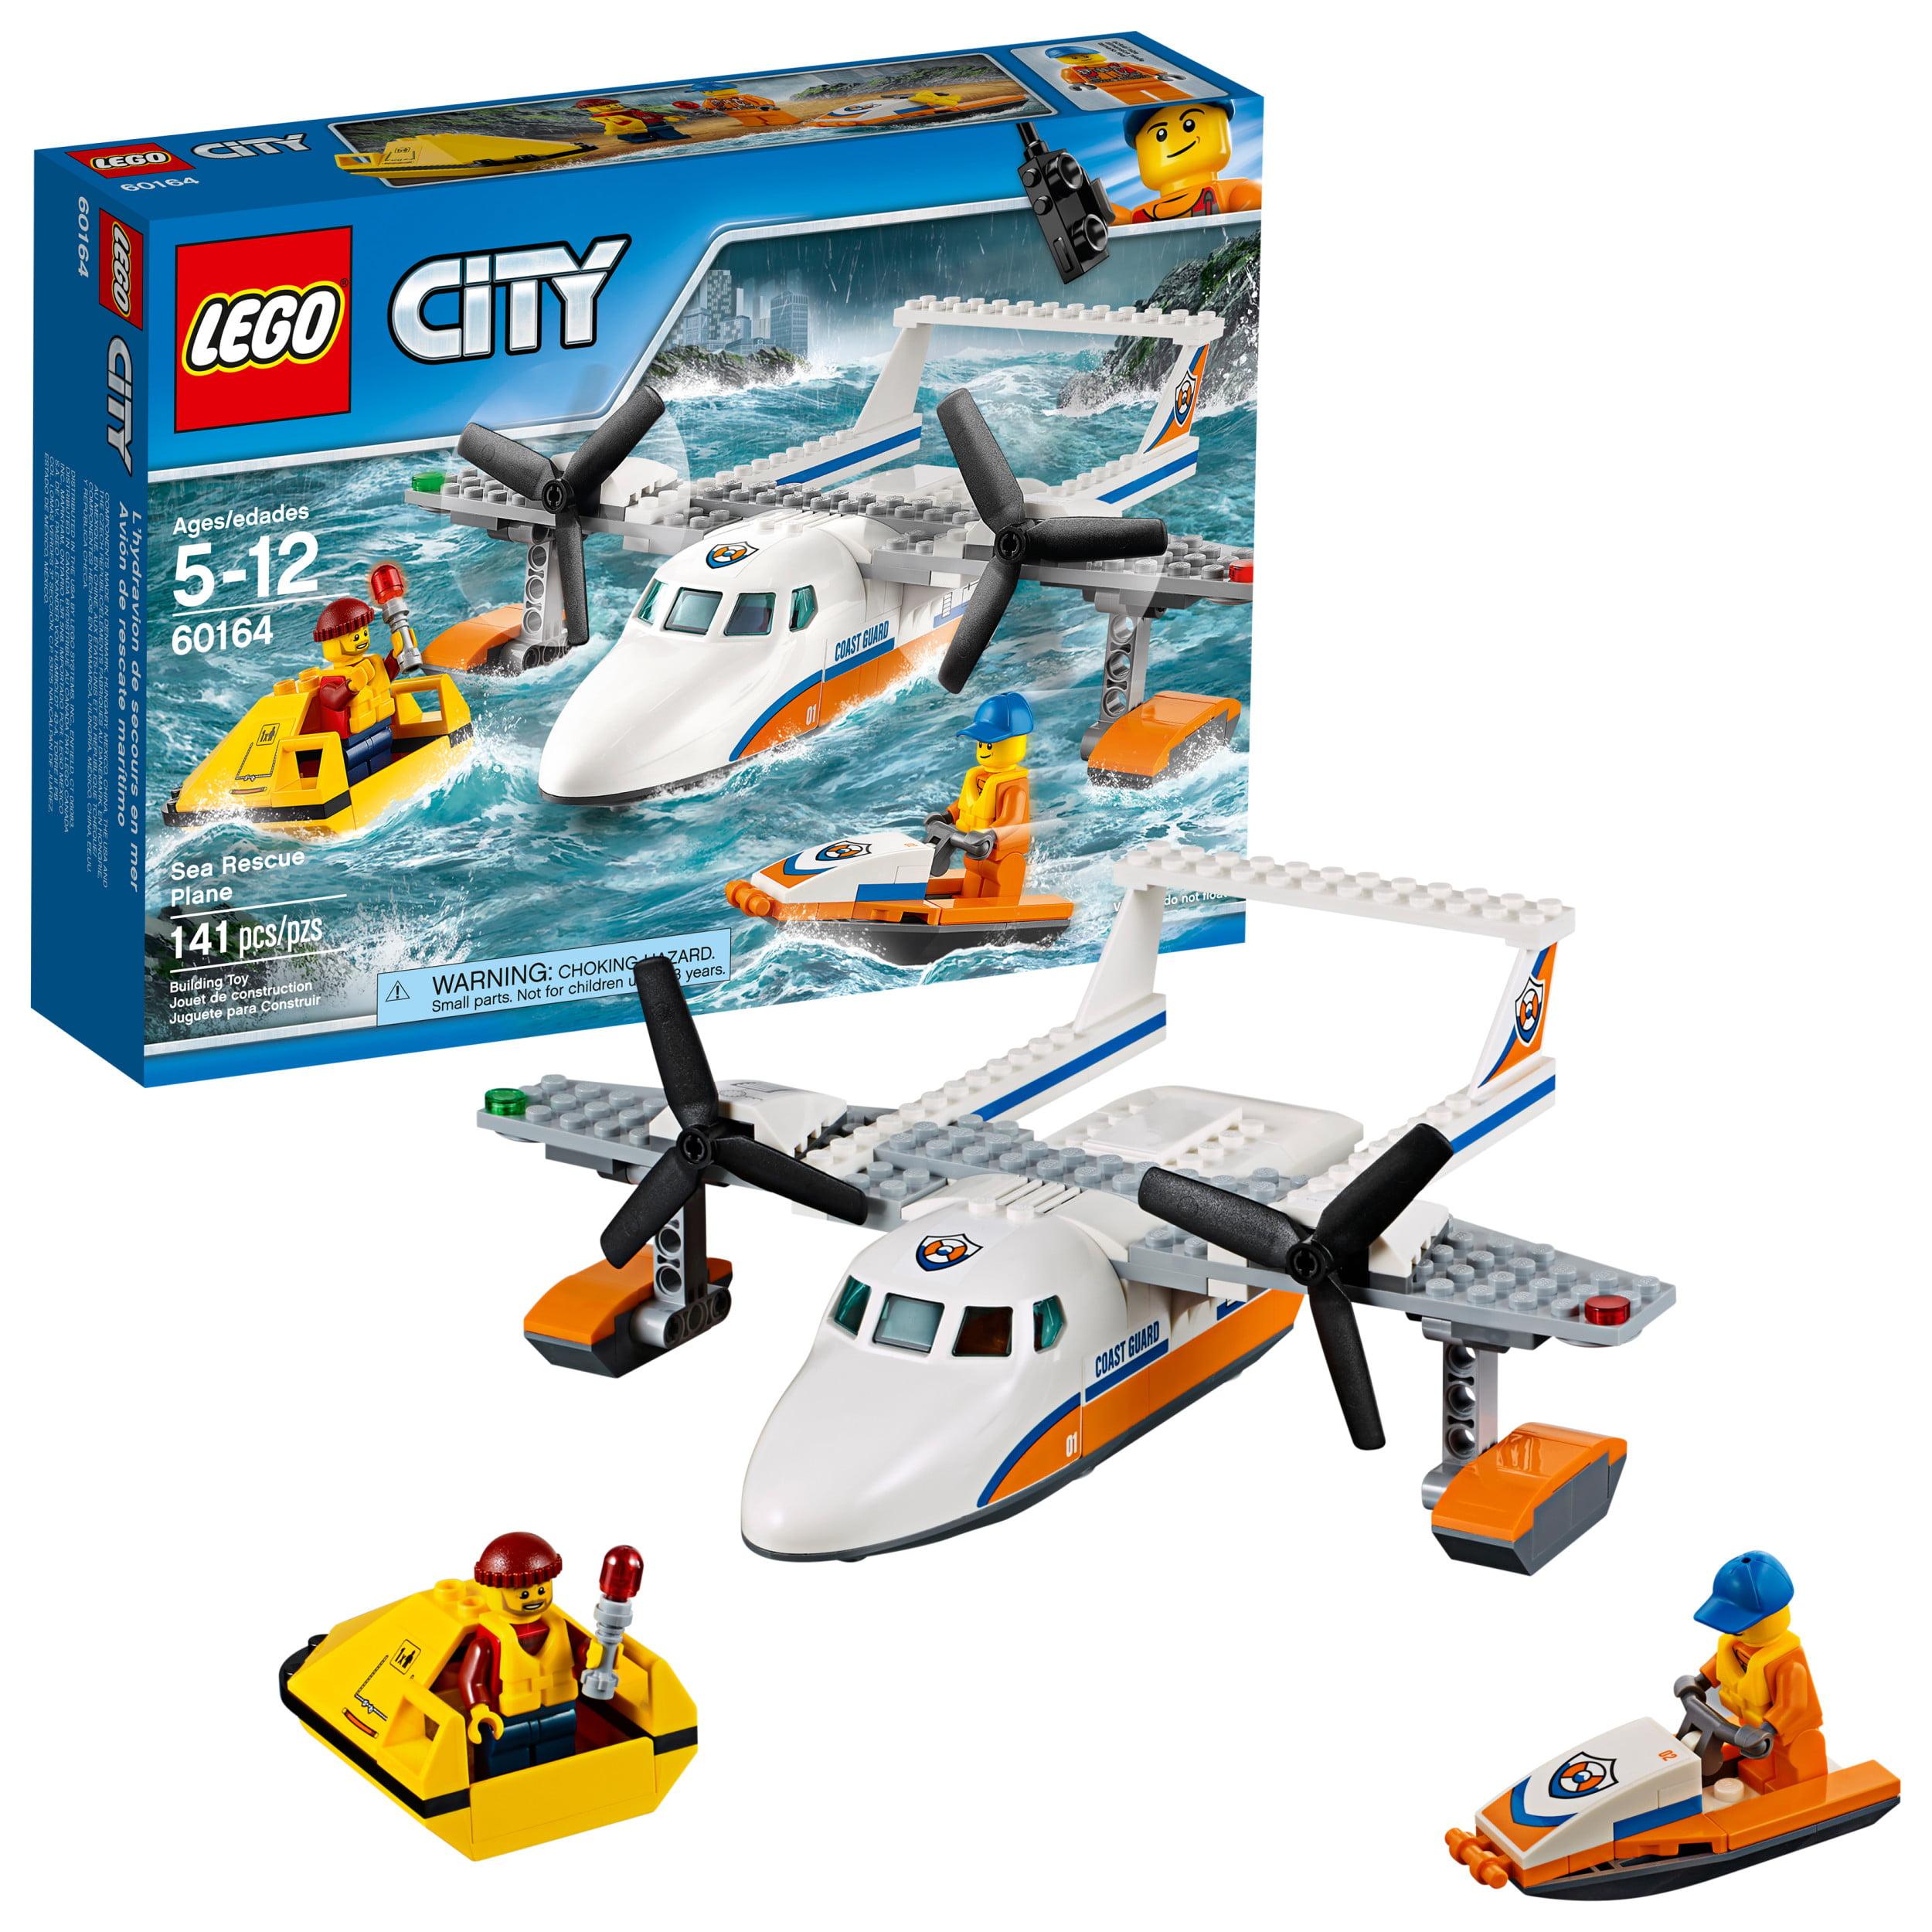 Lego City Coast Guard Sea Rescue Plane 60164 by Lego